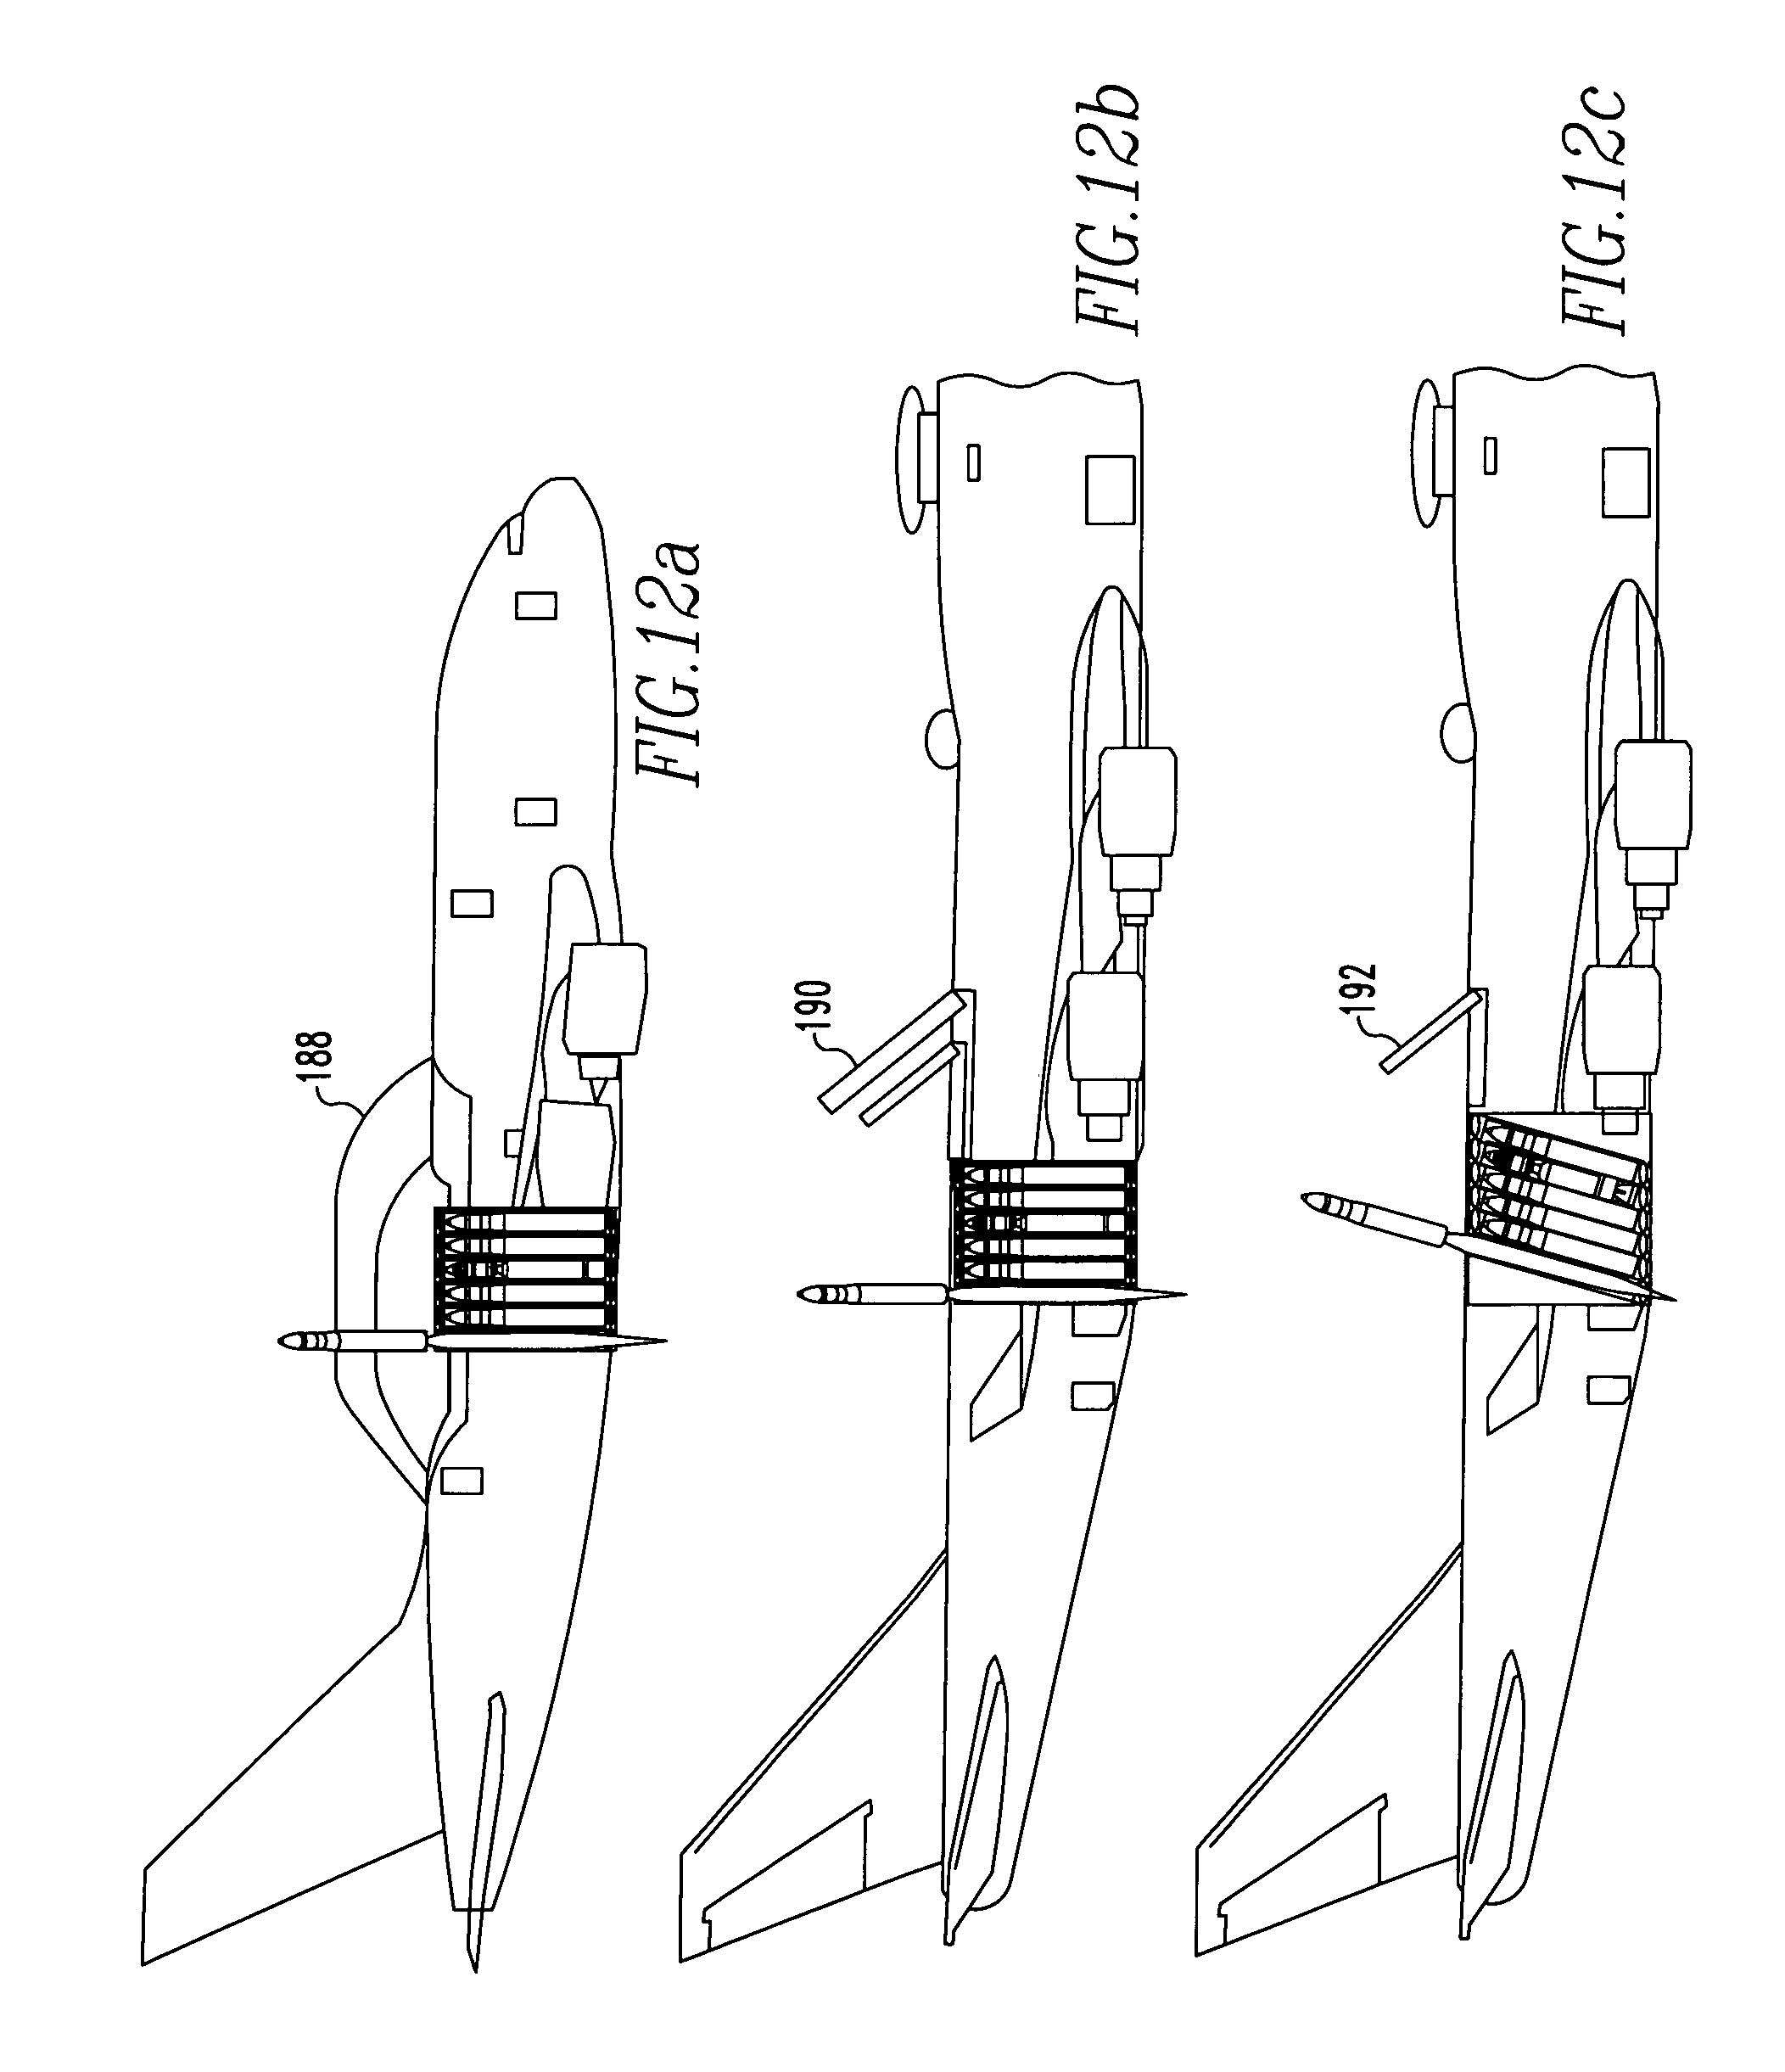 http://patentimages.storage.googleapis.com/US7540227B2/US07540227-20090602-D00027.png